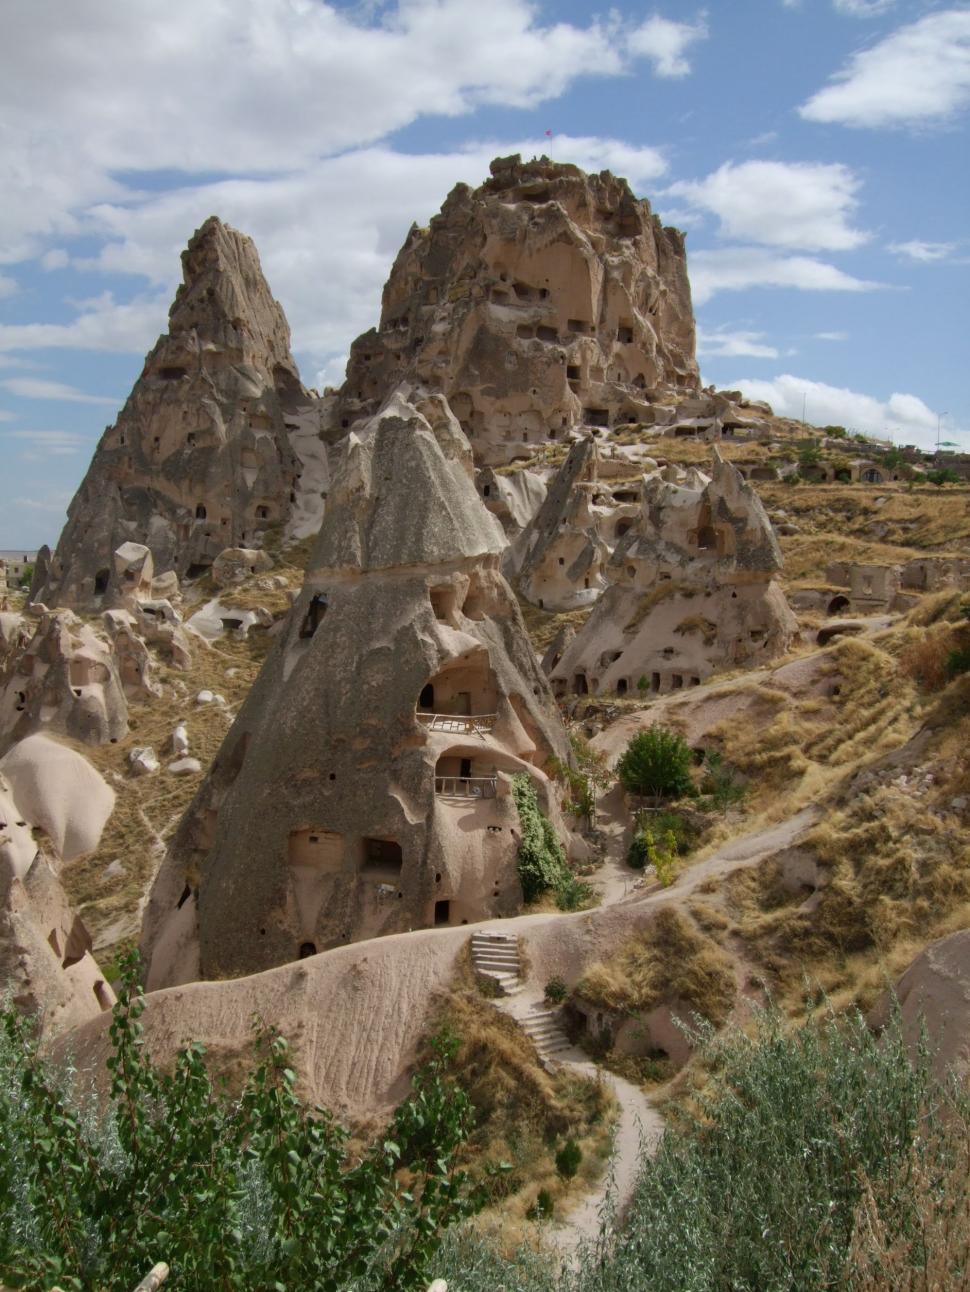 Download Free Stock HD Photo of Beautiful wide landscape from Cappadocia in Turkey  Online